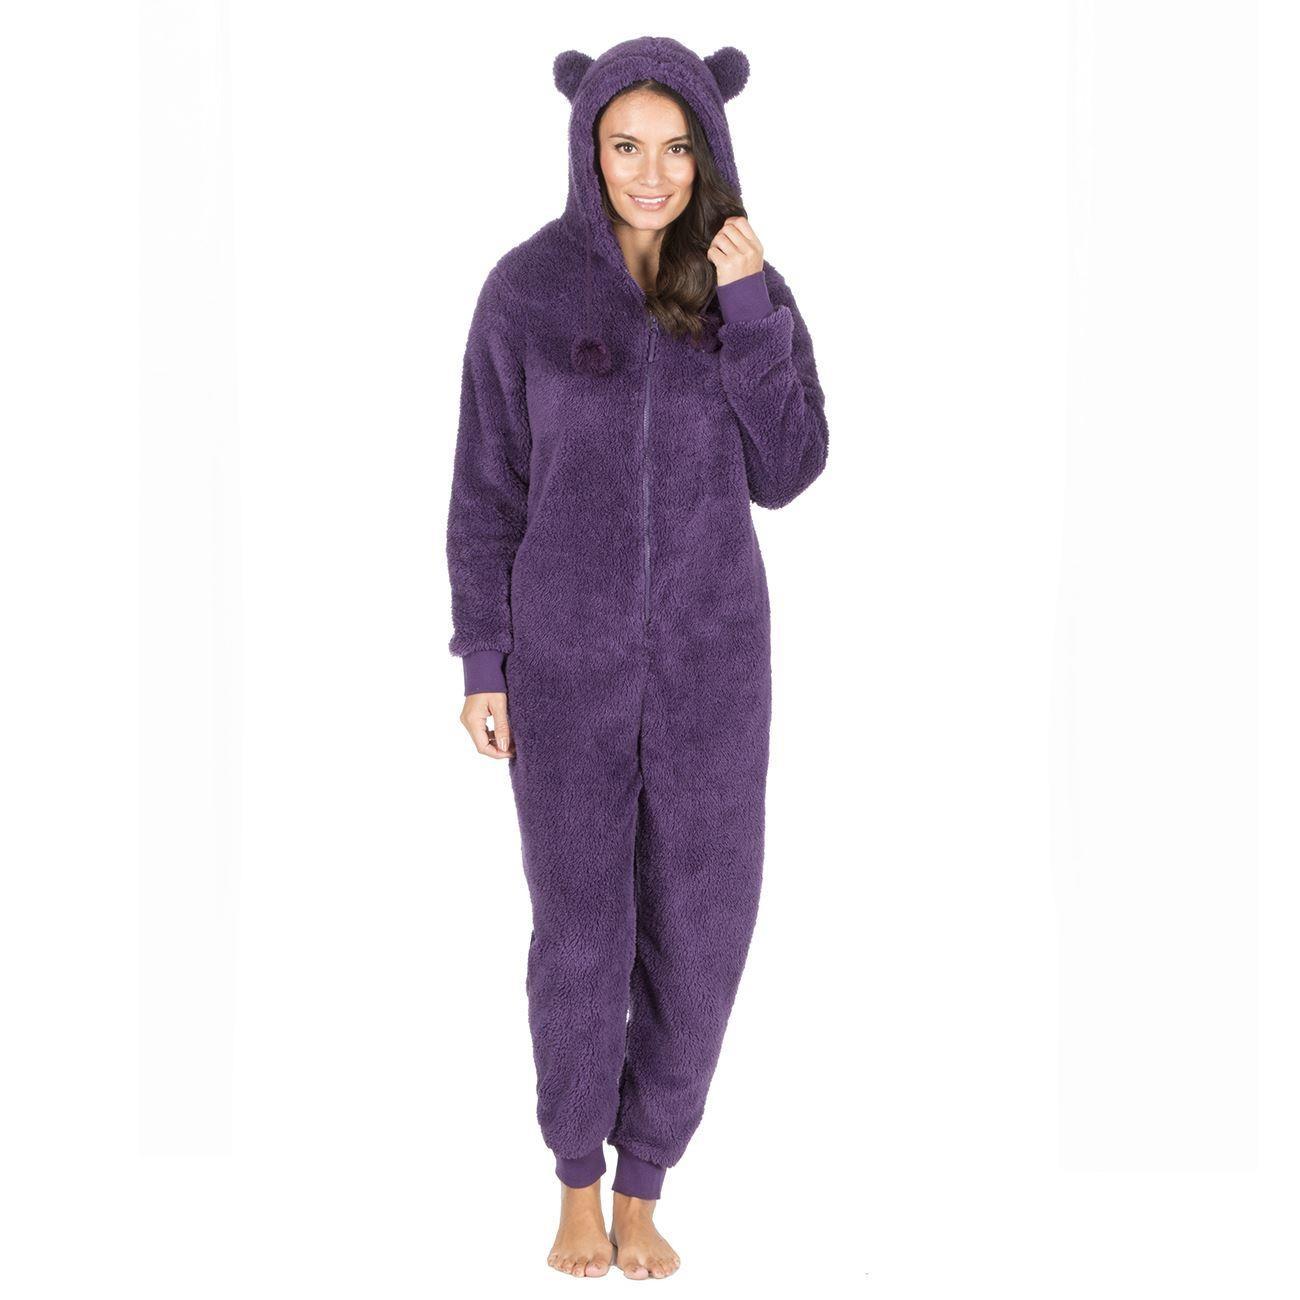 Onezee Snuggle Fleece Onesie - Purple